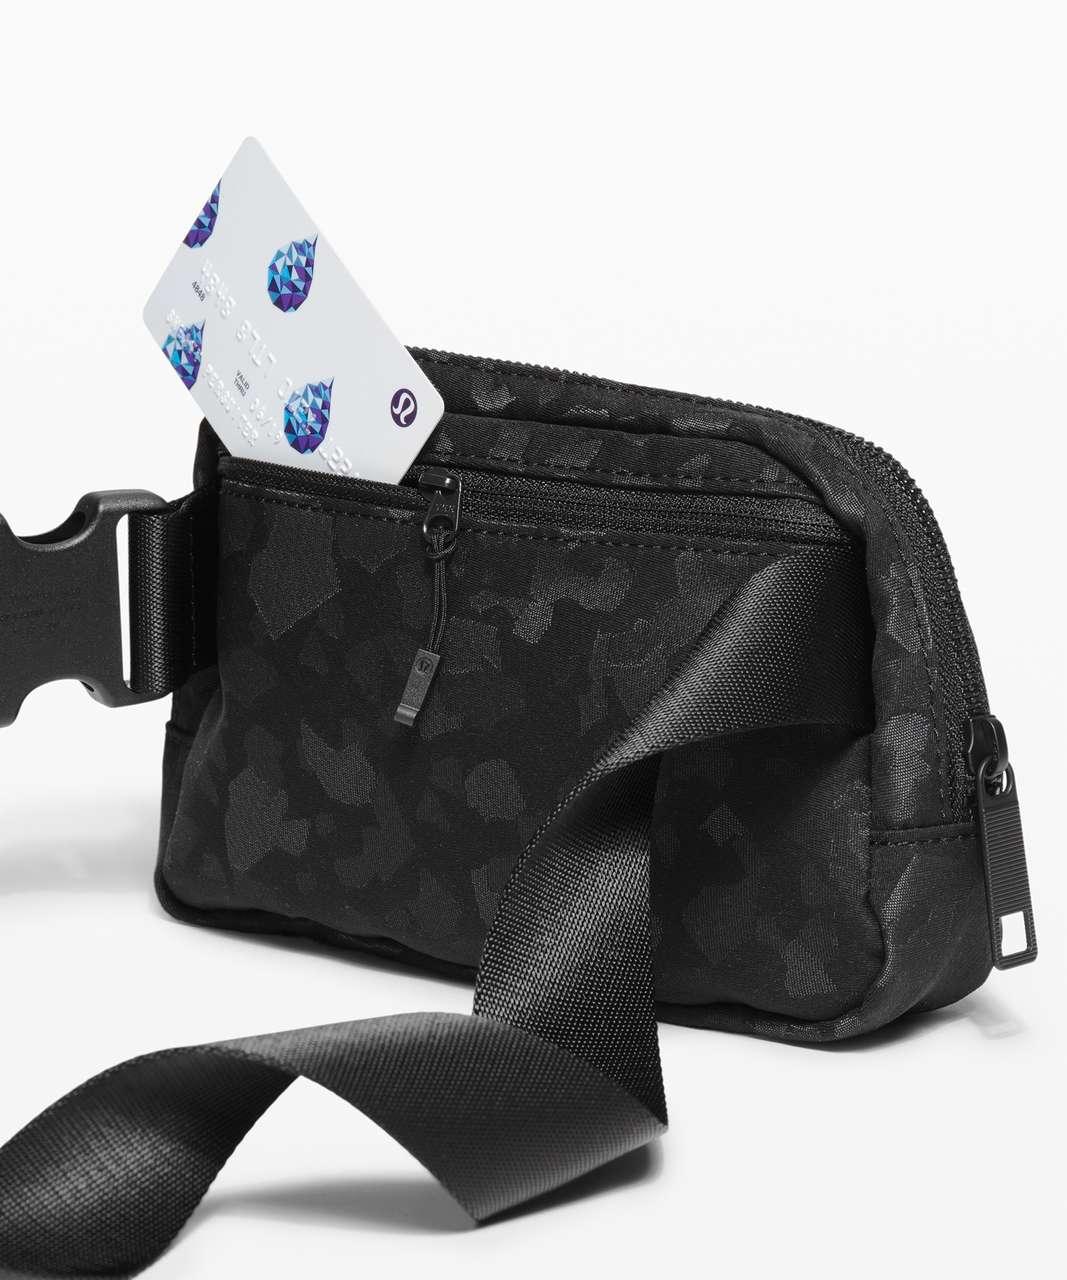 Lululemon Everywhere Belt Bag *1L - Fragment Camo Jacquard Black Deep Coal